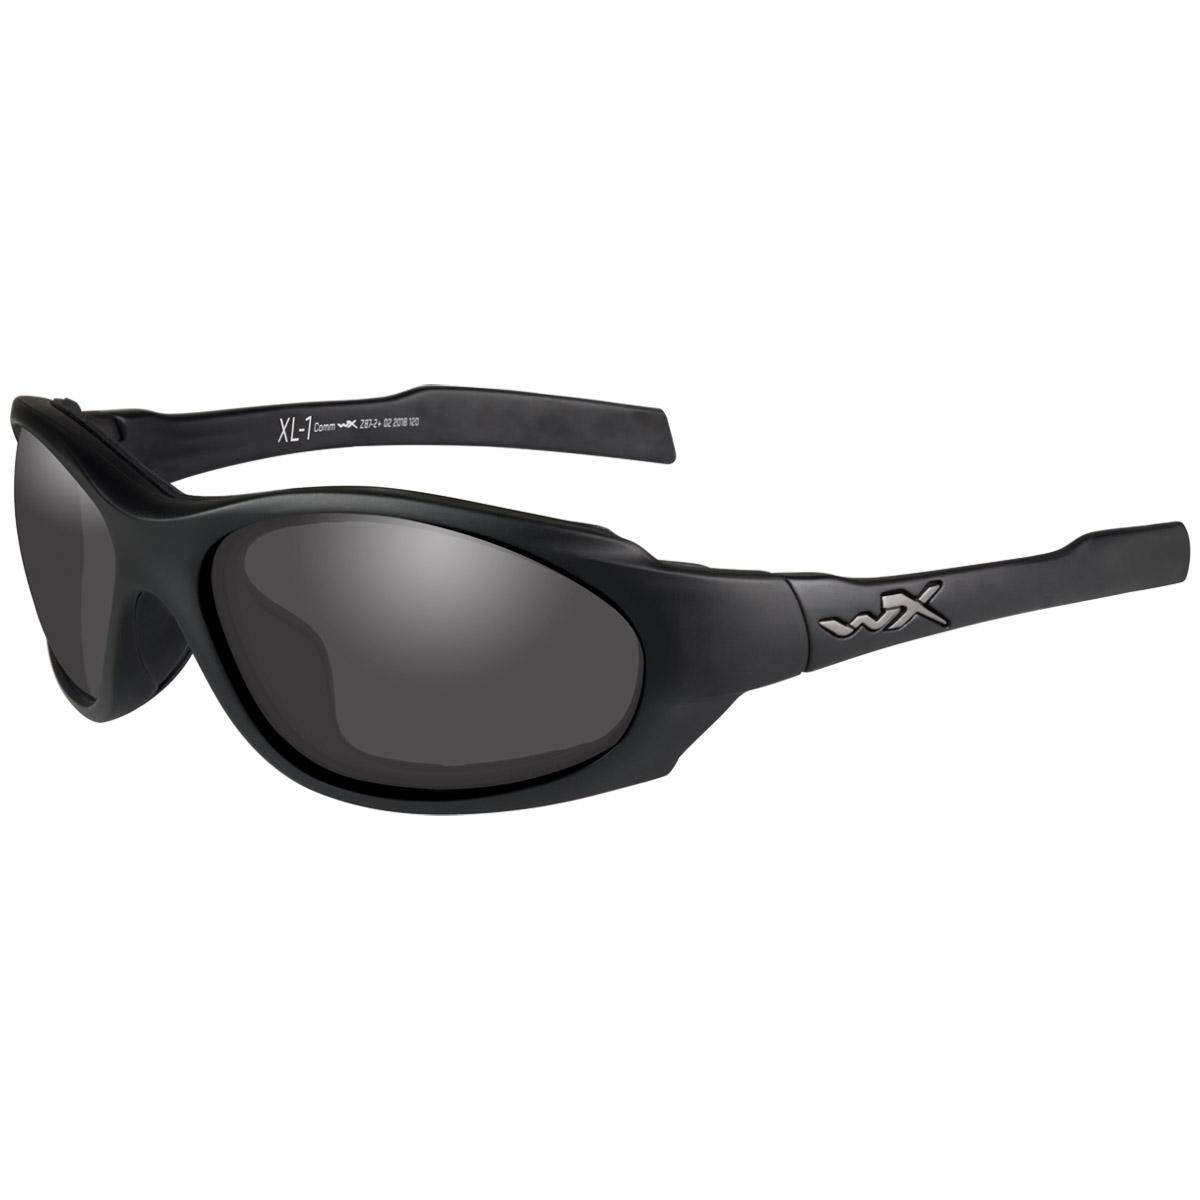 Wiley X XL-1 Advanced COMM Sunglasses with 3 Ballistic Lenses Matte Black Frame